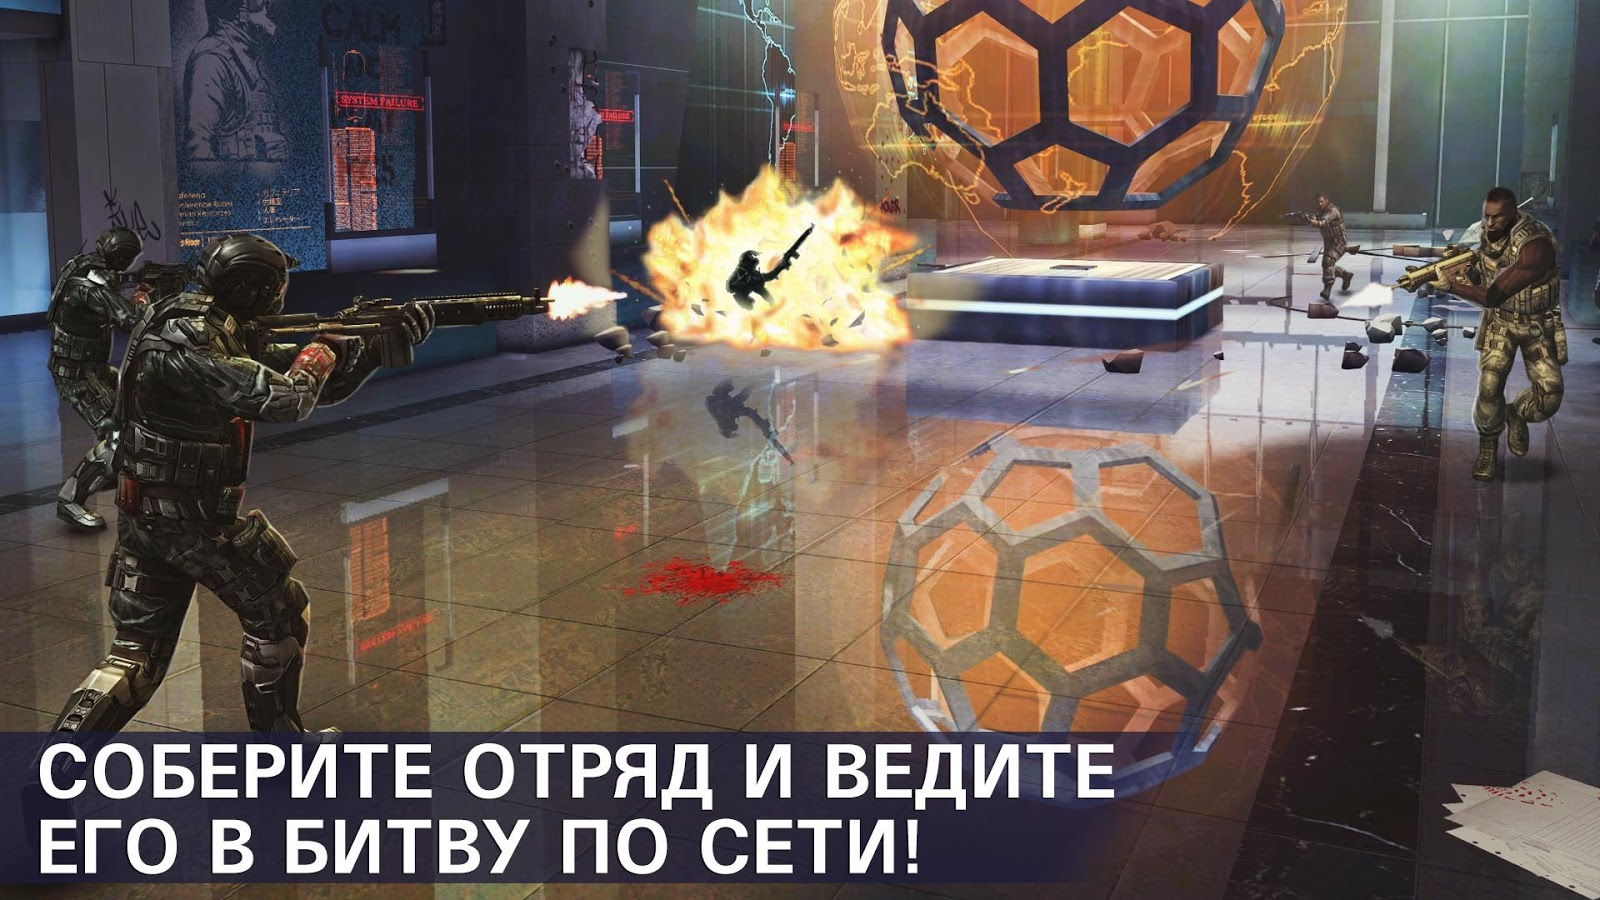 Modern Combat 5: Затмение / Modern Combat 5: Blackout [v1.0.0] [RUS/ENG] [Игры для Android]